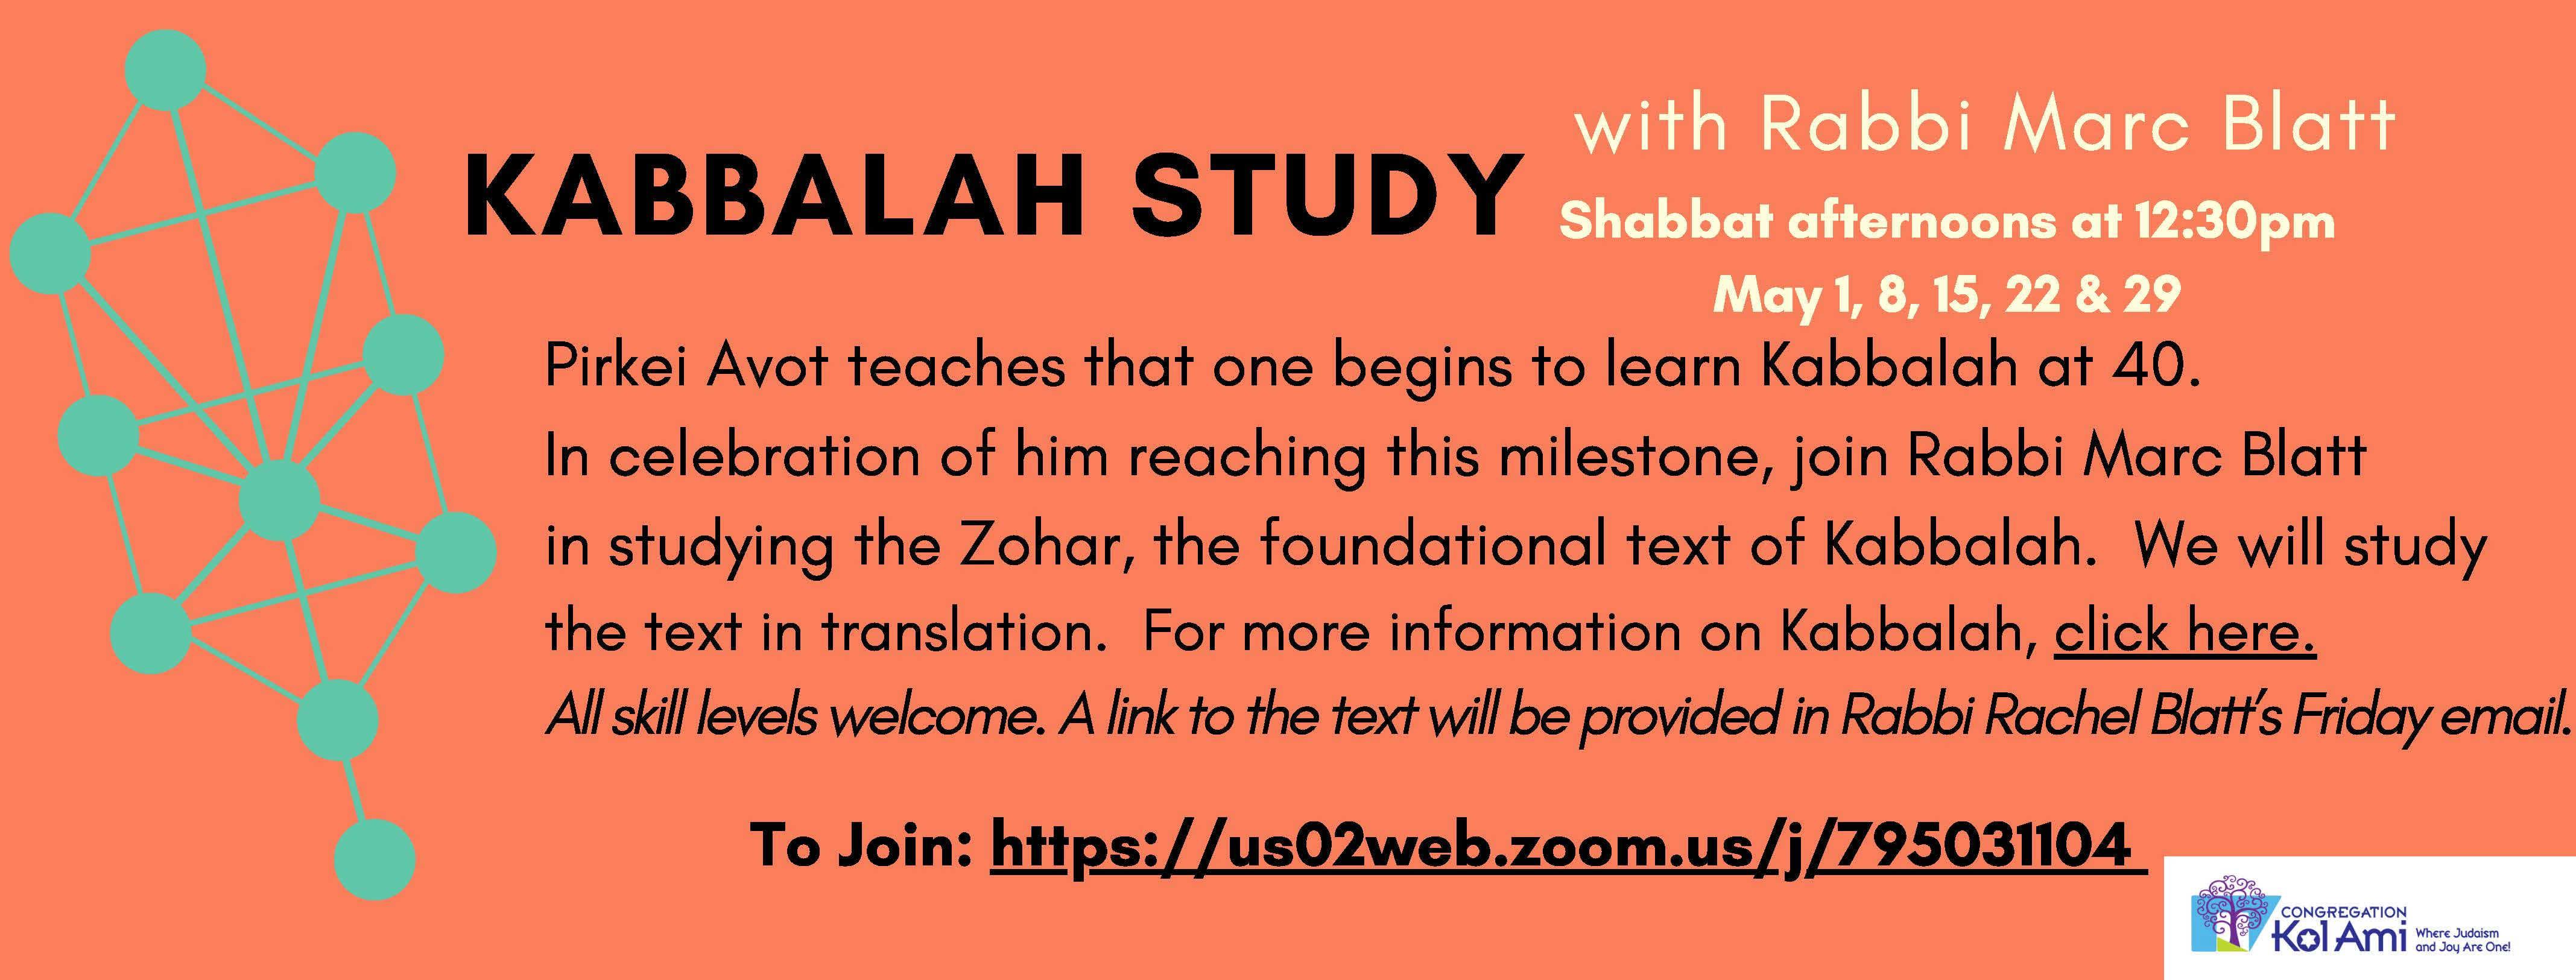 Banner Image for Virtual Kabbalah Study After Services with Rabbi Marc Blatt